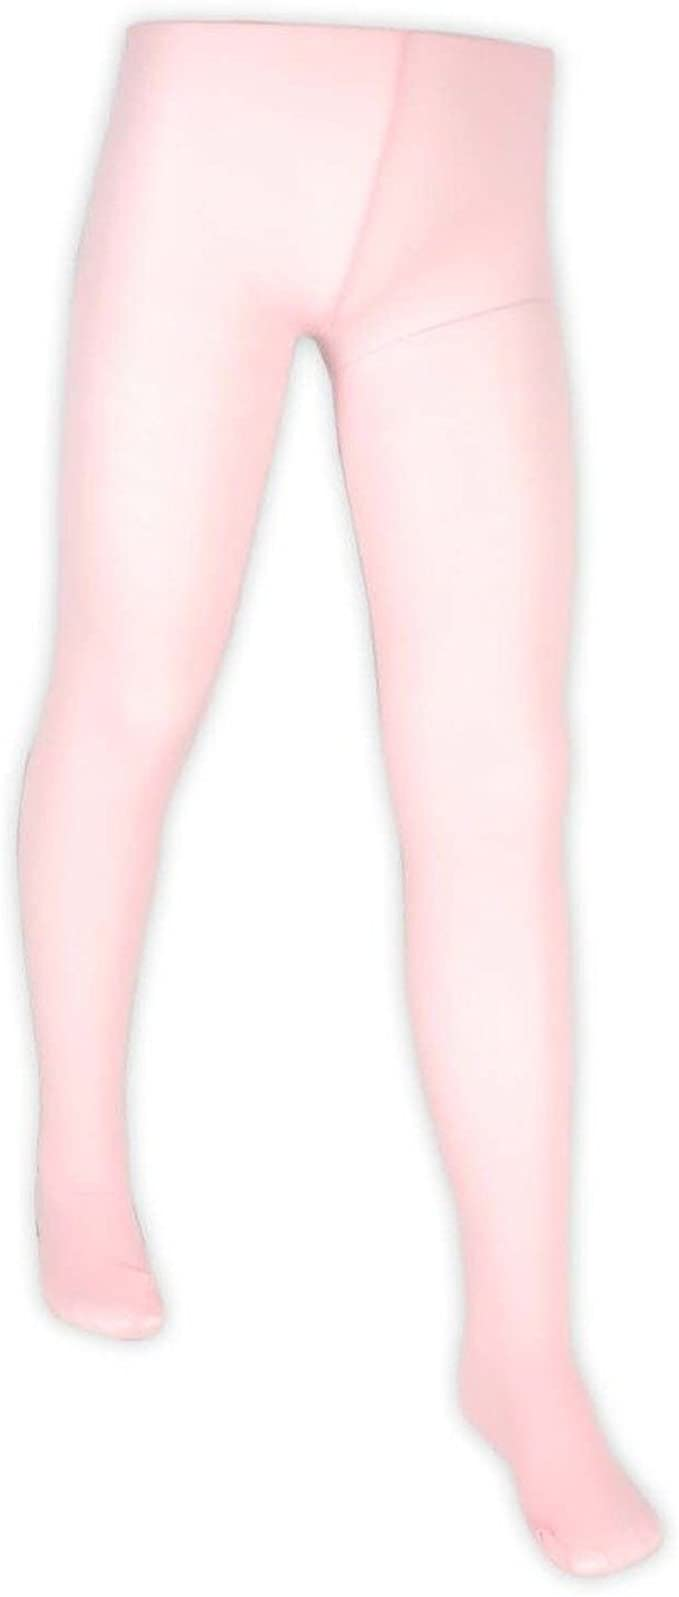 Girls 40 Denier Elasticated Ballerina Ballet Dance Tights One Size 16 Colours